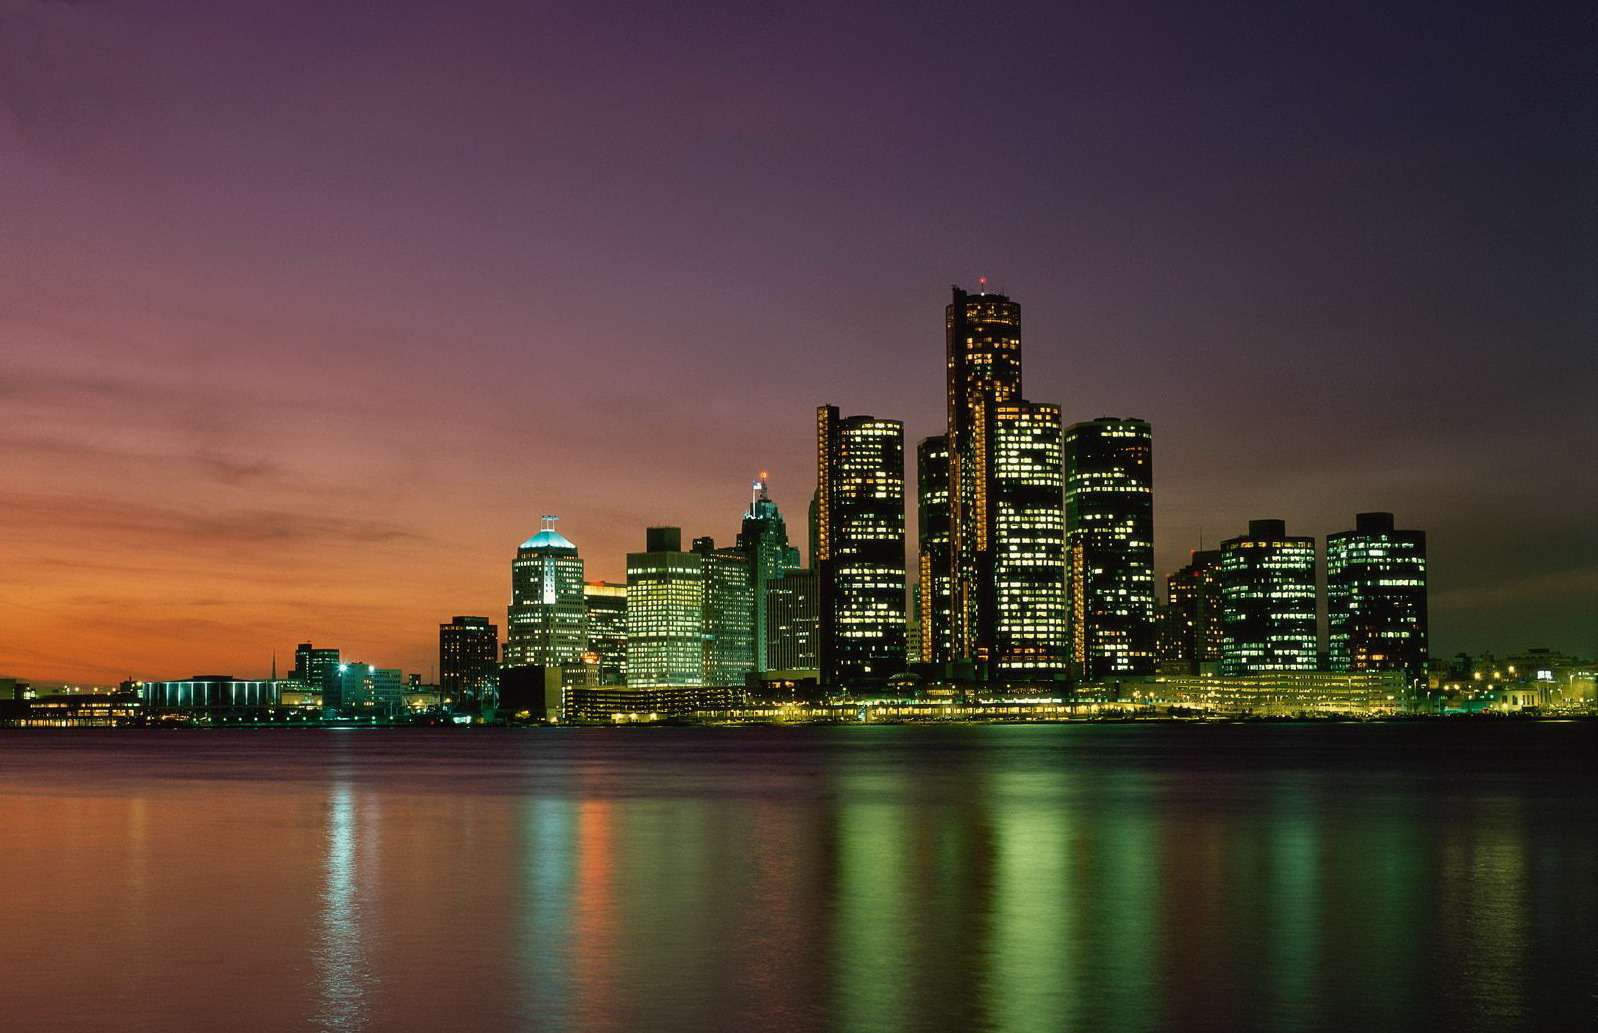 Ночная панорама Детройта